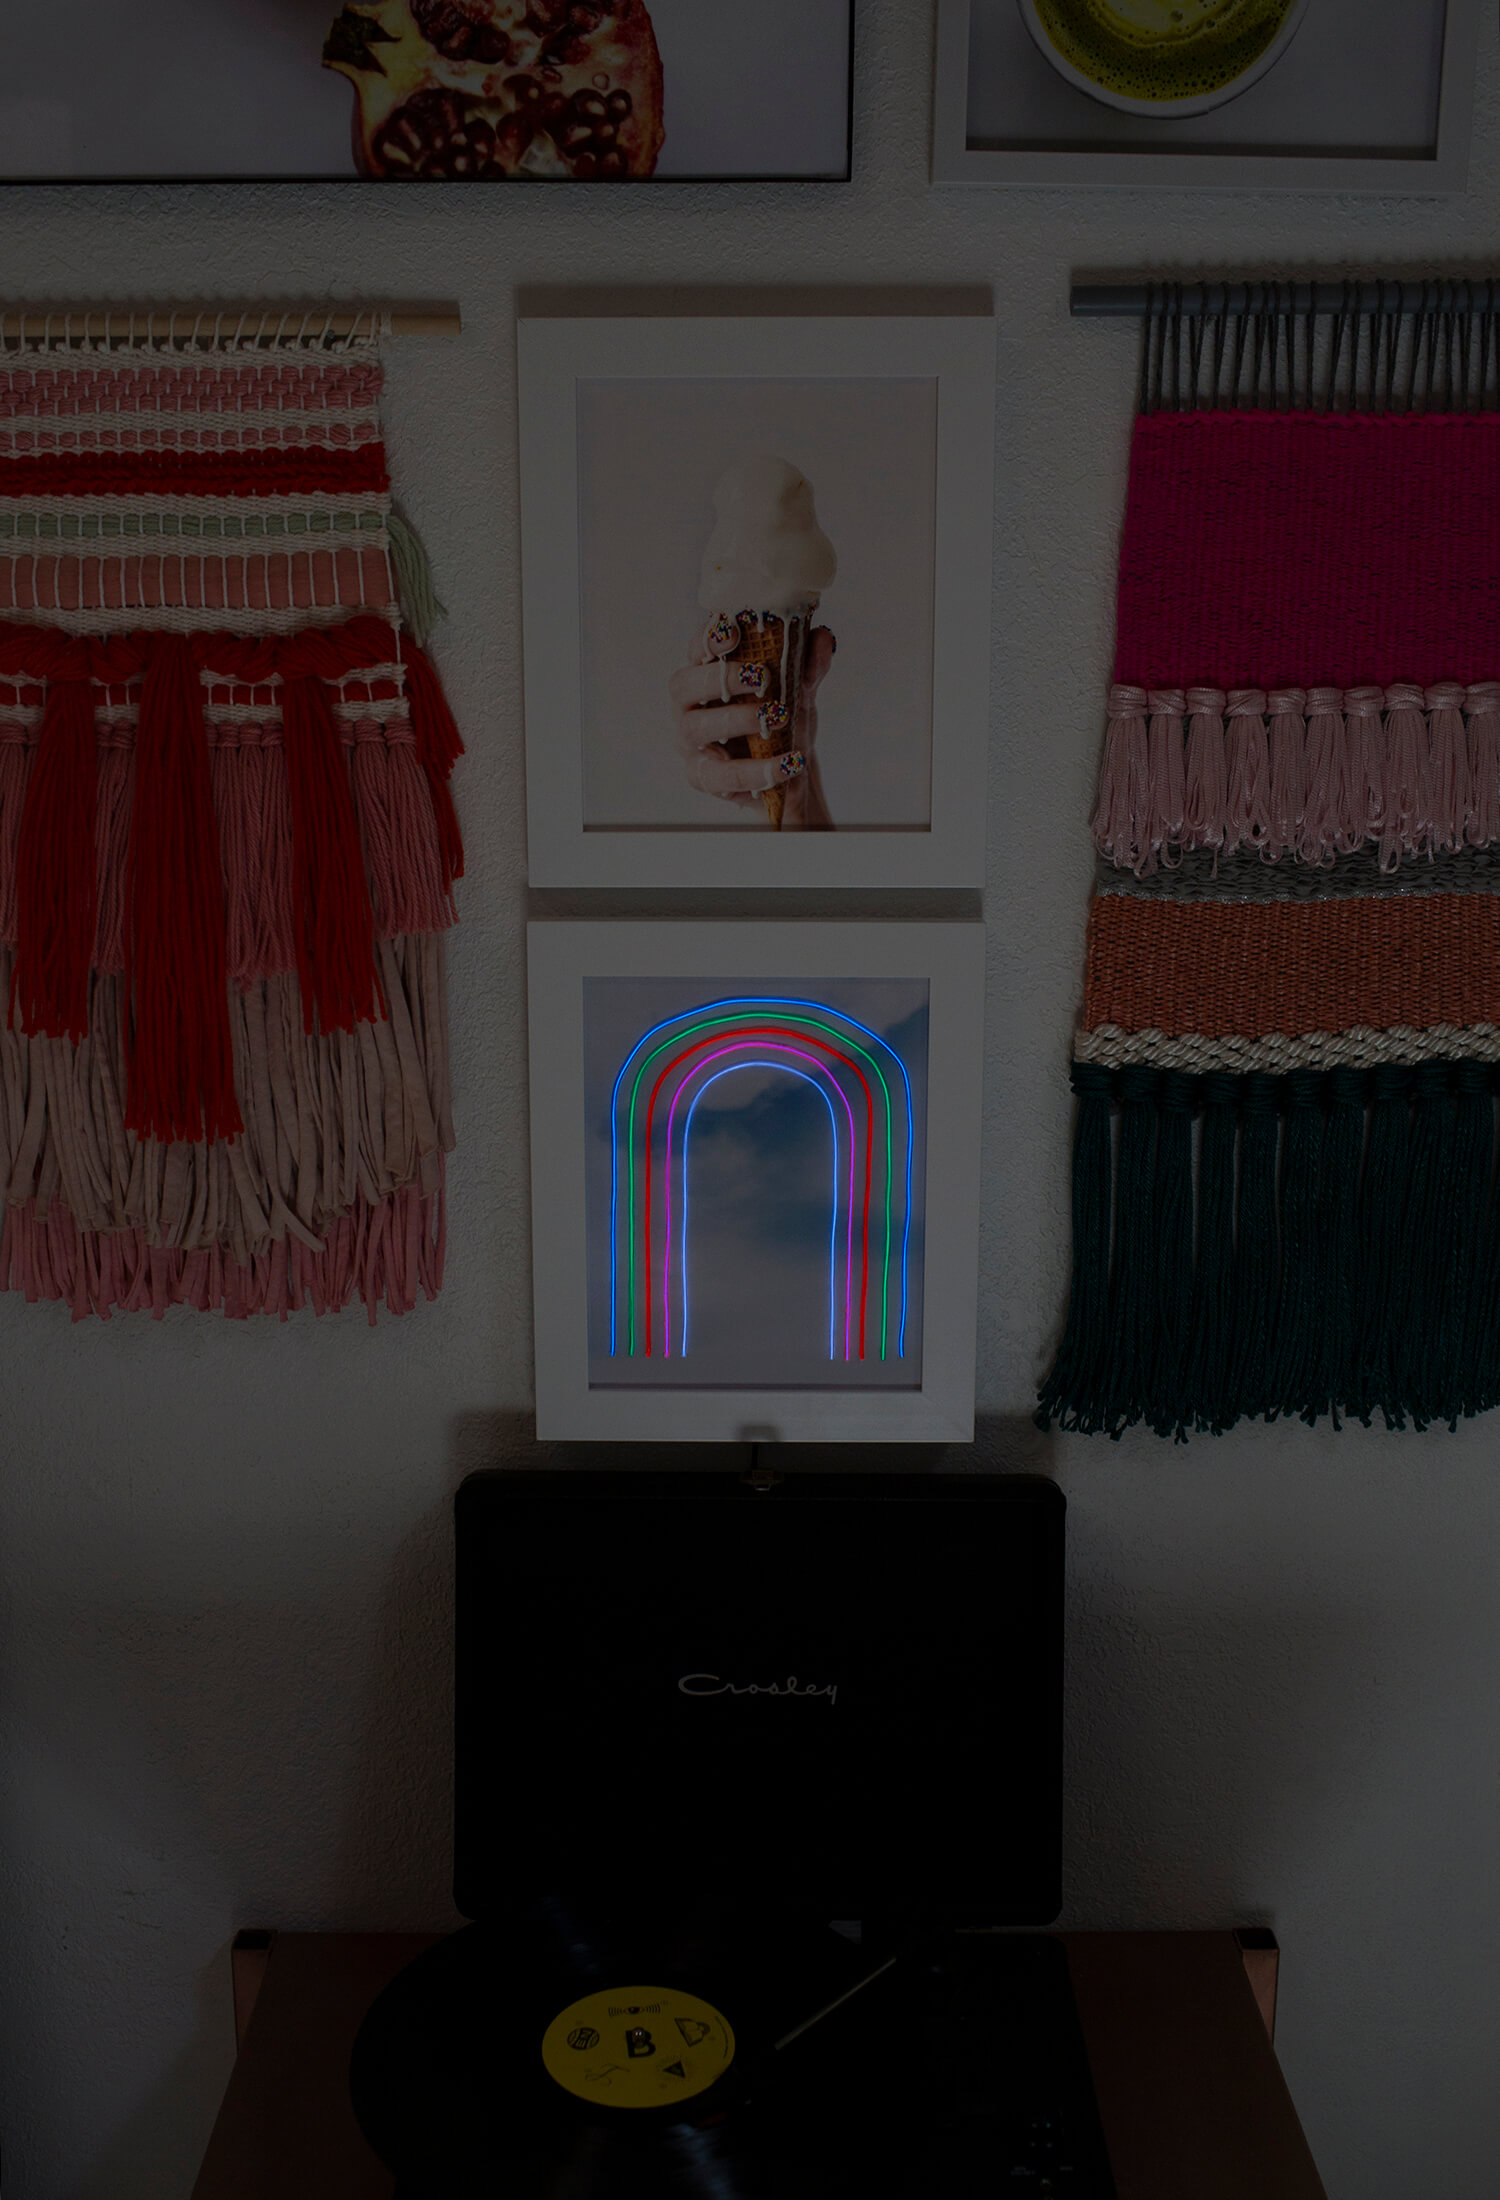 DIY Rainbow Neon Sign (via abeautifulmess.com)